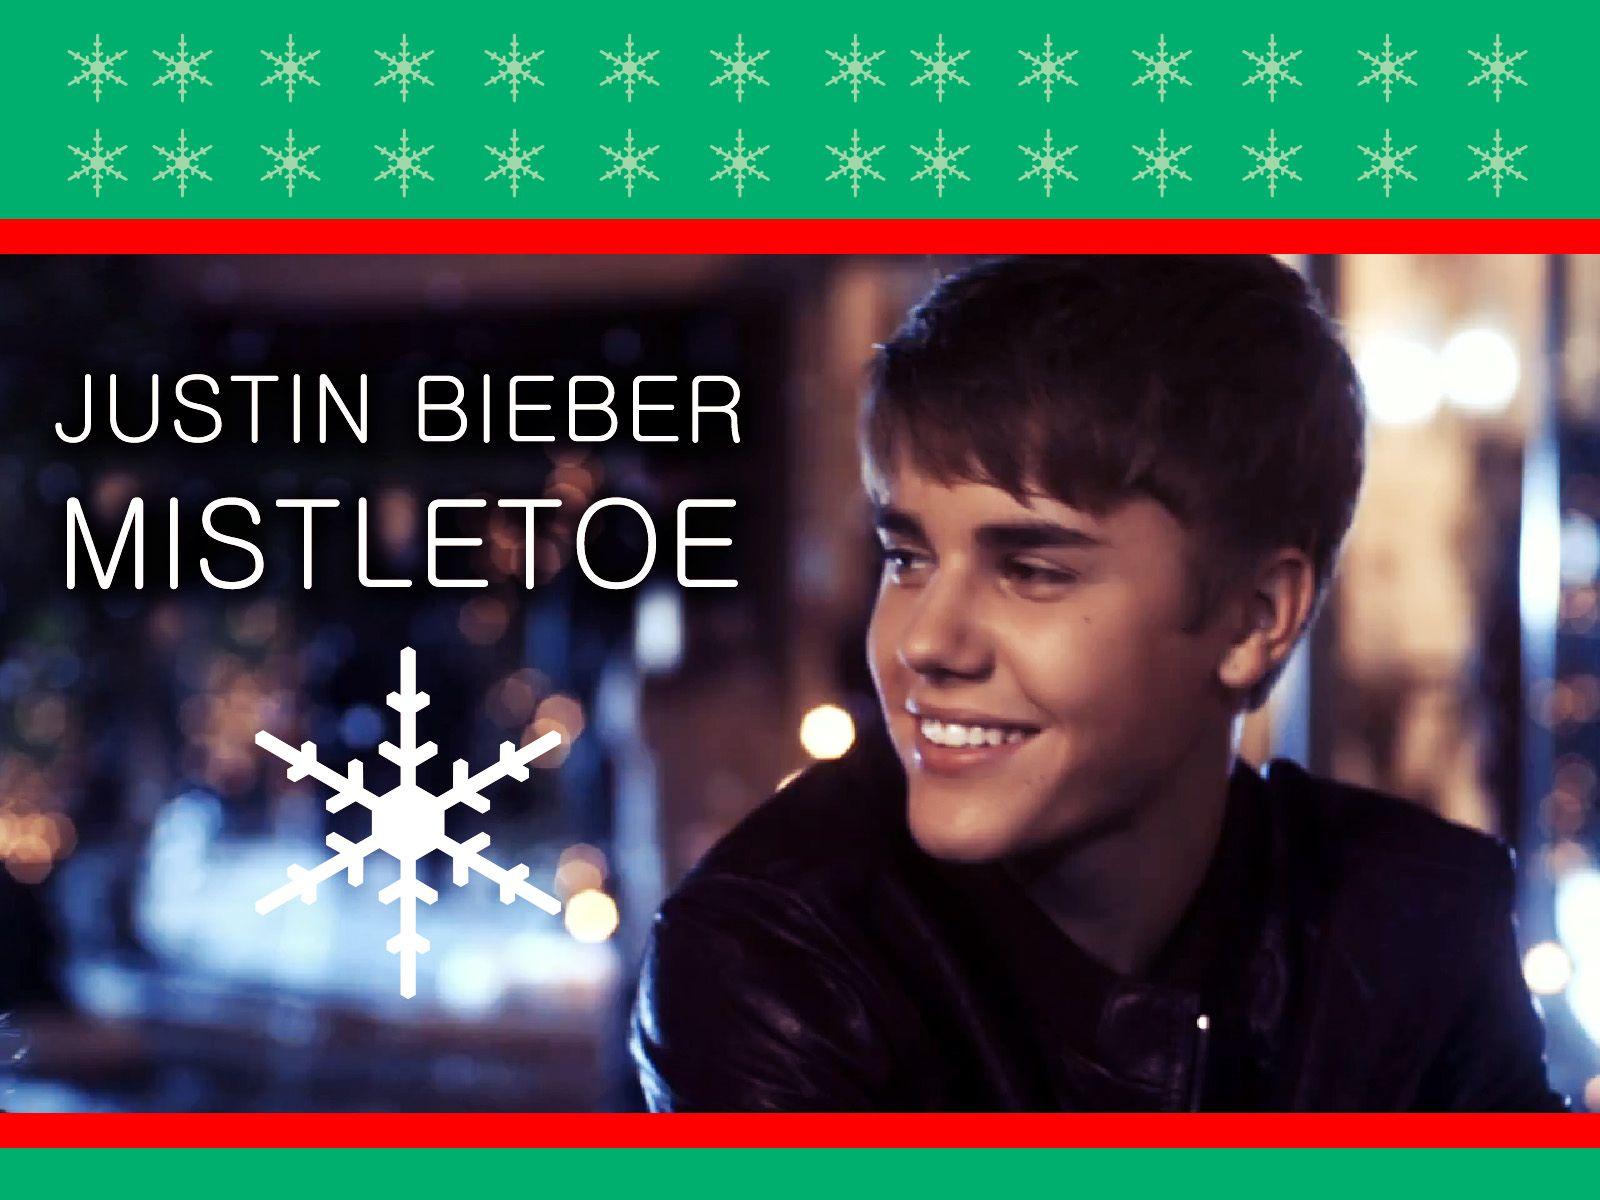 Mistletoe by Justin Bieber Early Christmas Promo - Kenalsworld ...